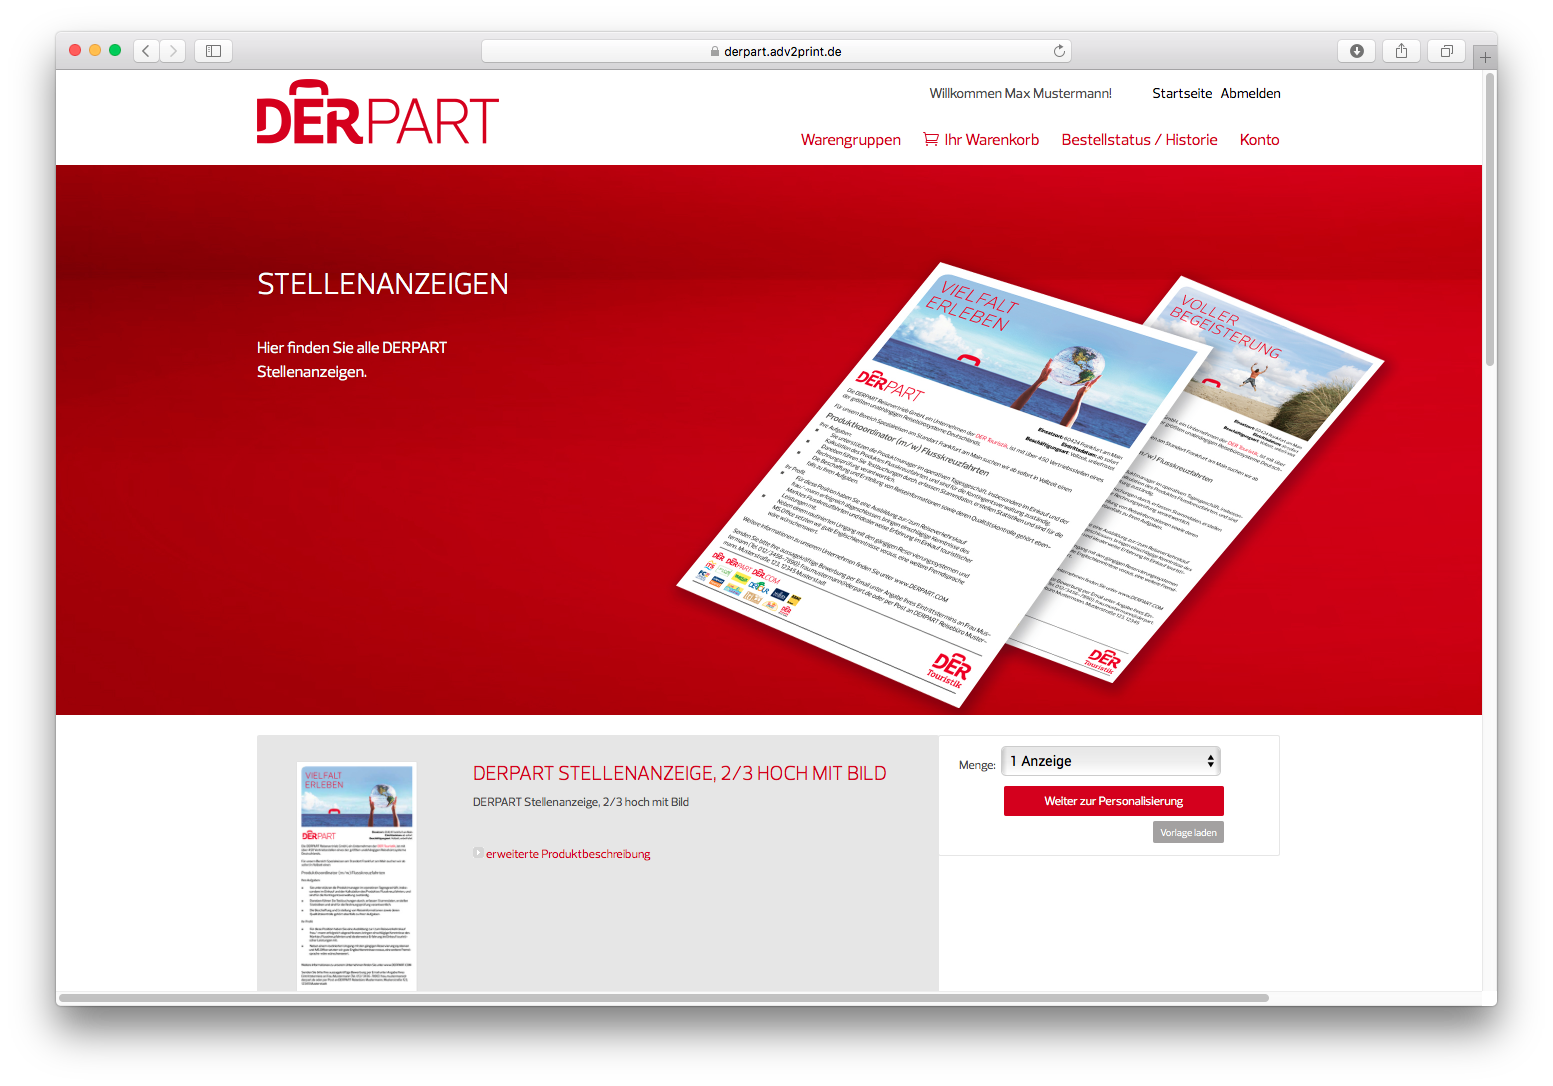 bk_derpart_web2print_5